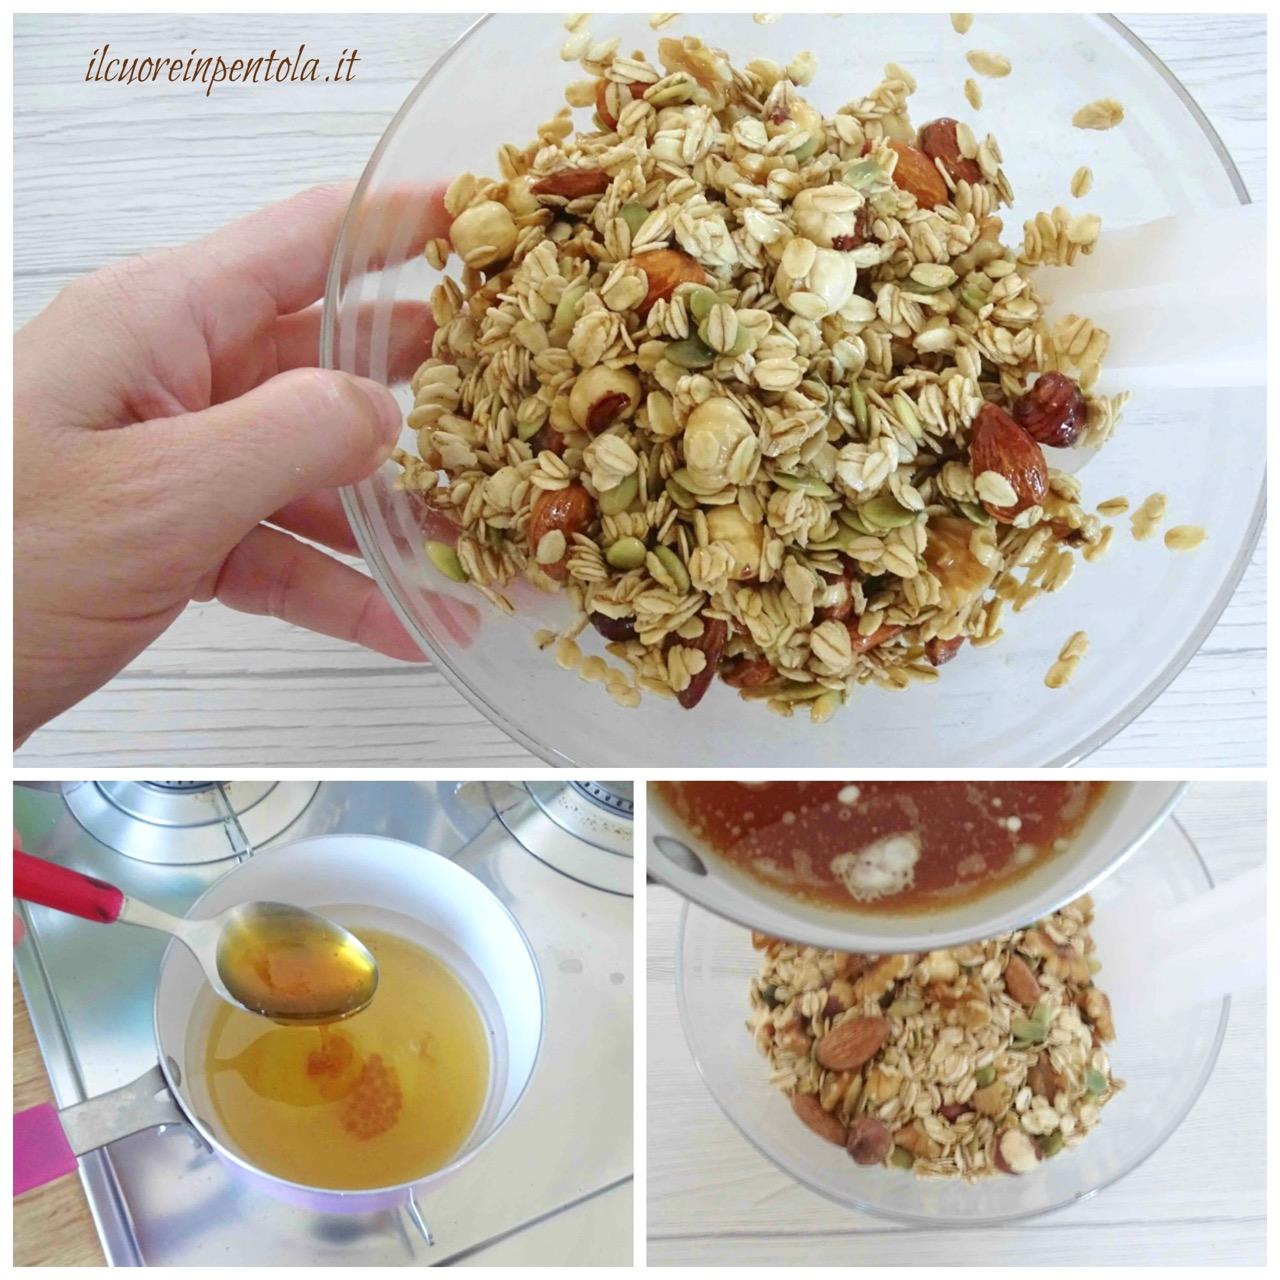 inumidire granola